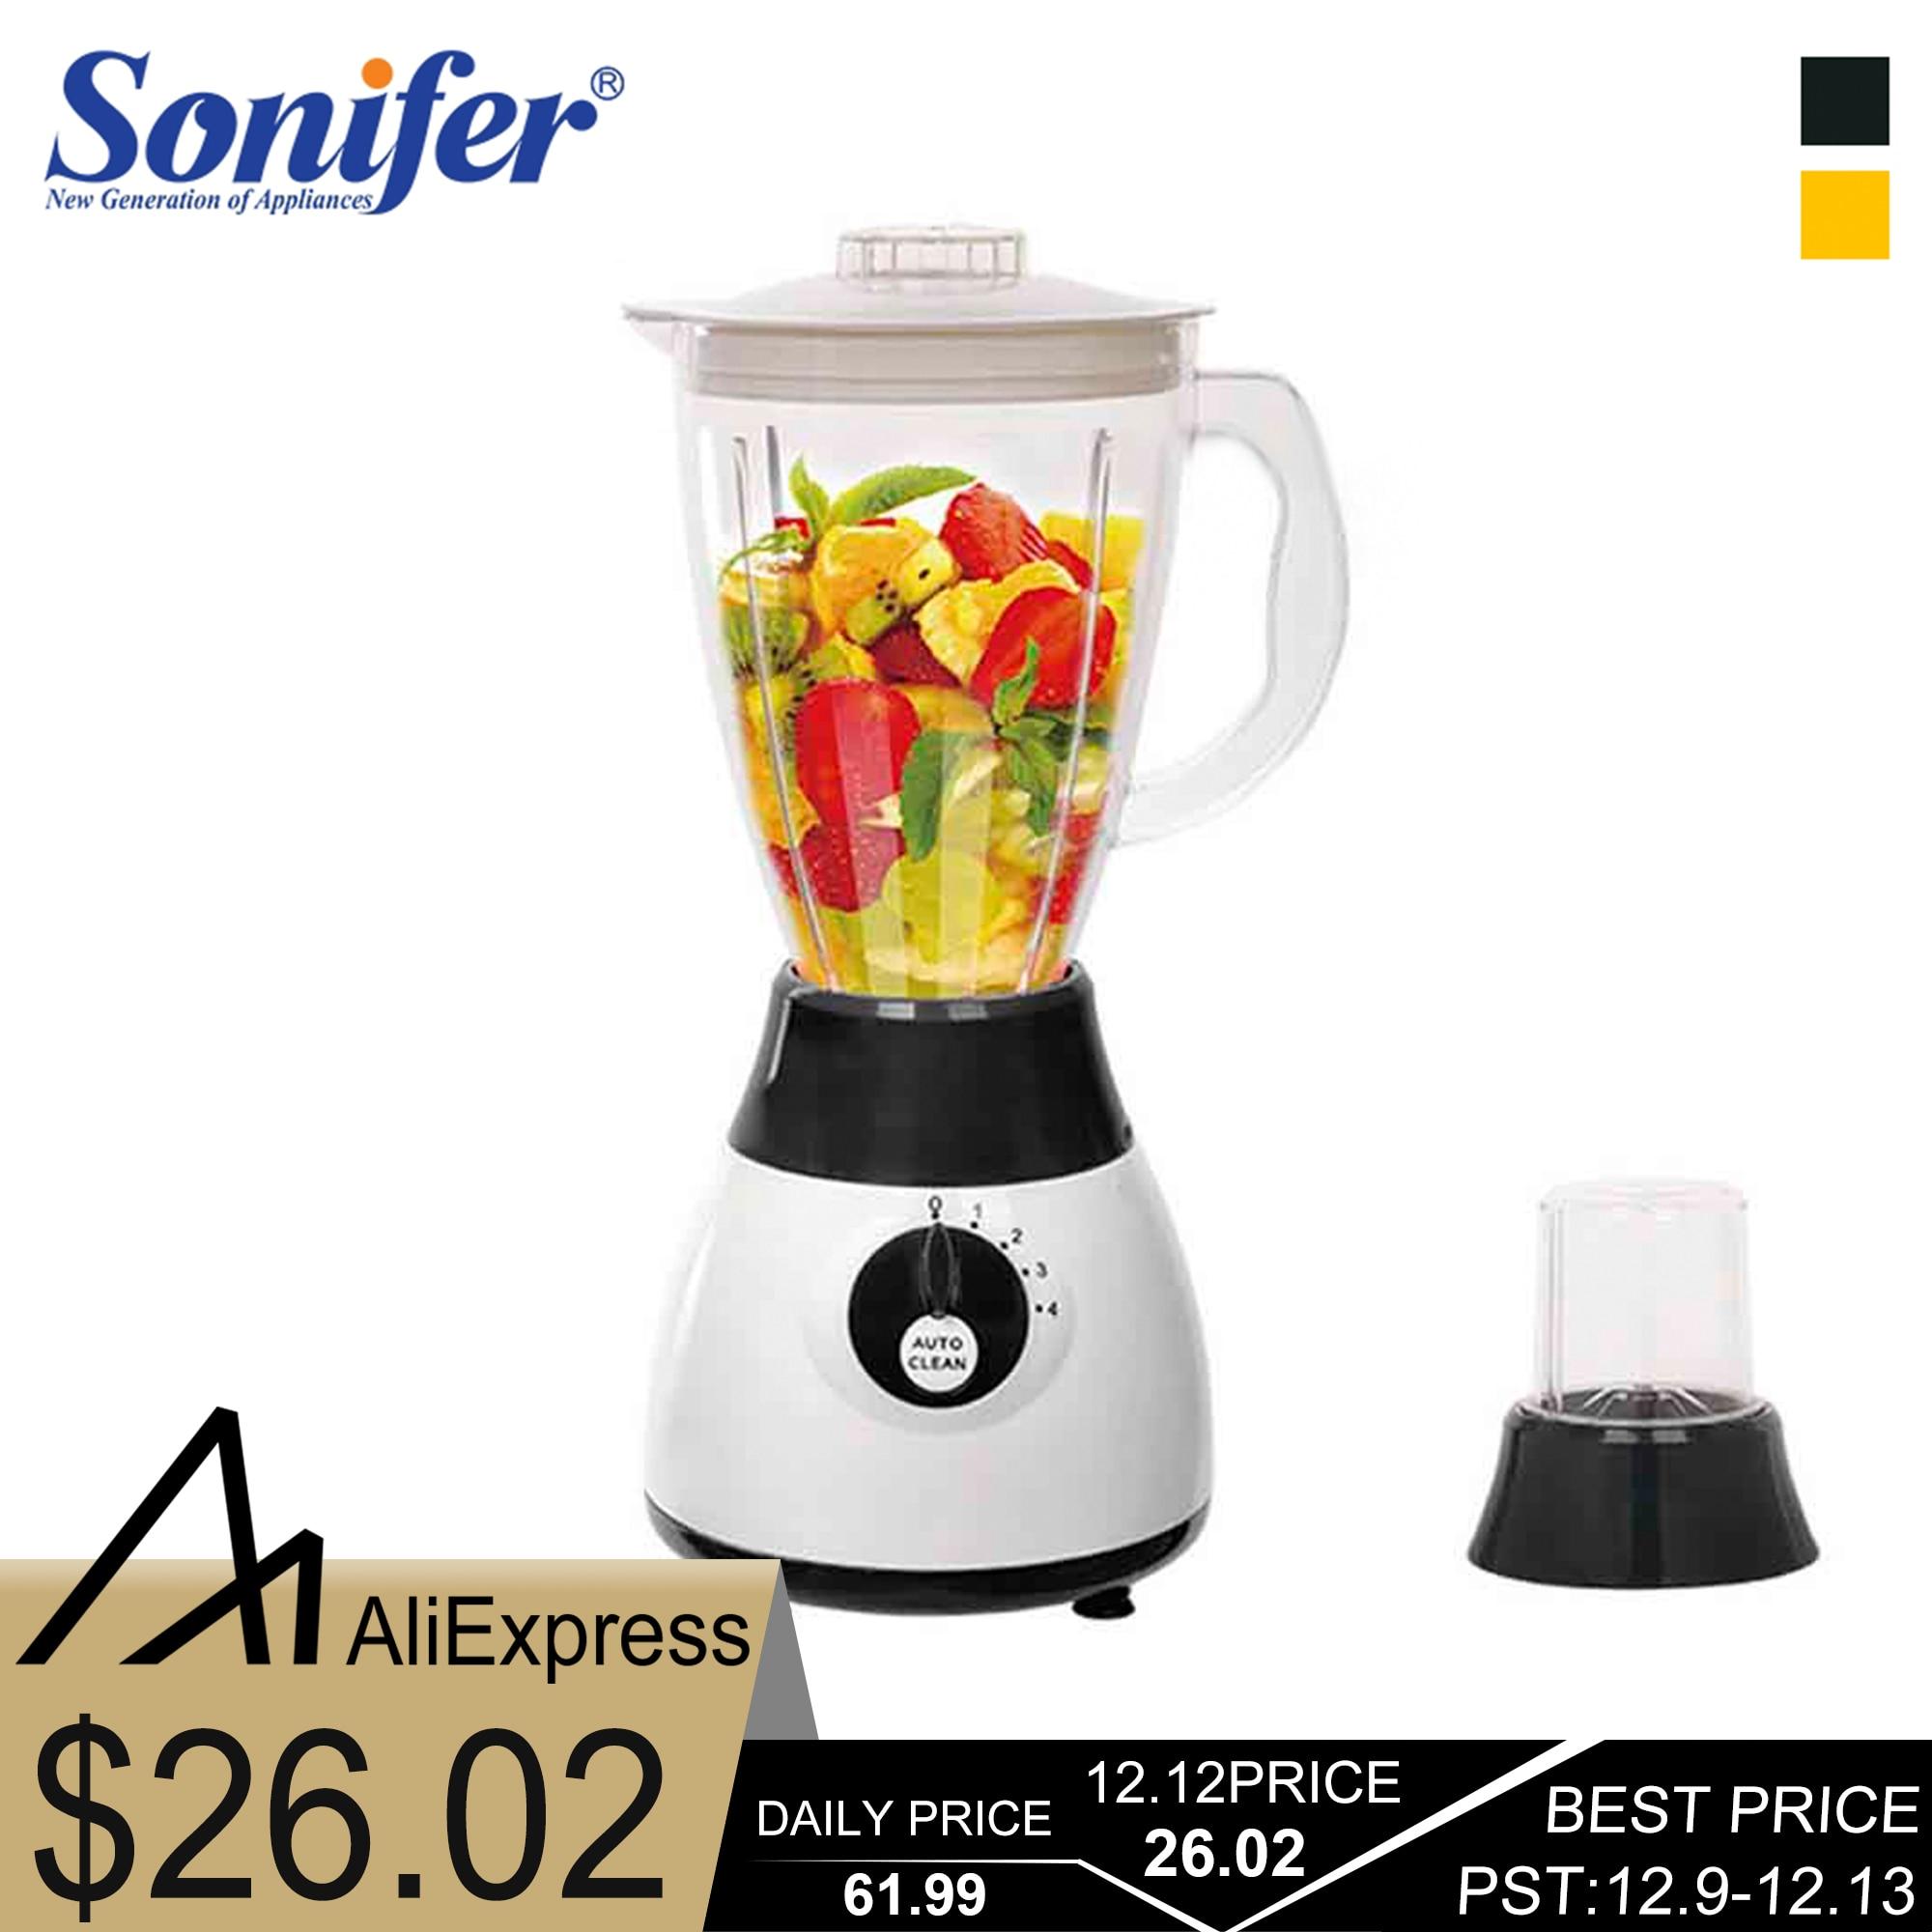 300W Electric Food Processor Professional Blender Mixer Kitchen Appliances Blenders for Electric Fruits and Vegetables Sonifer